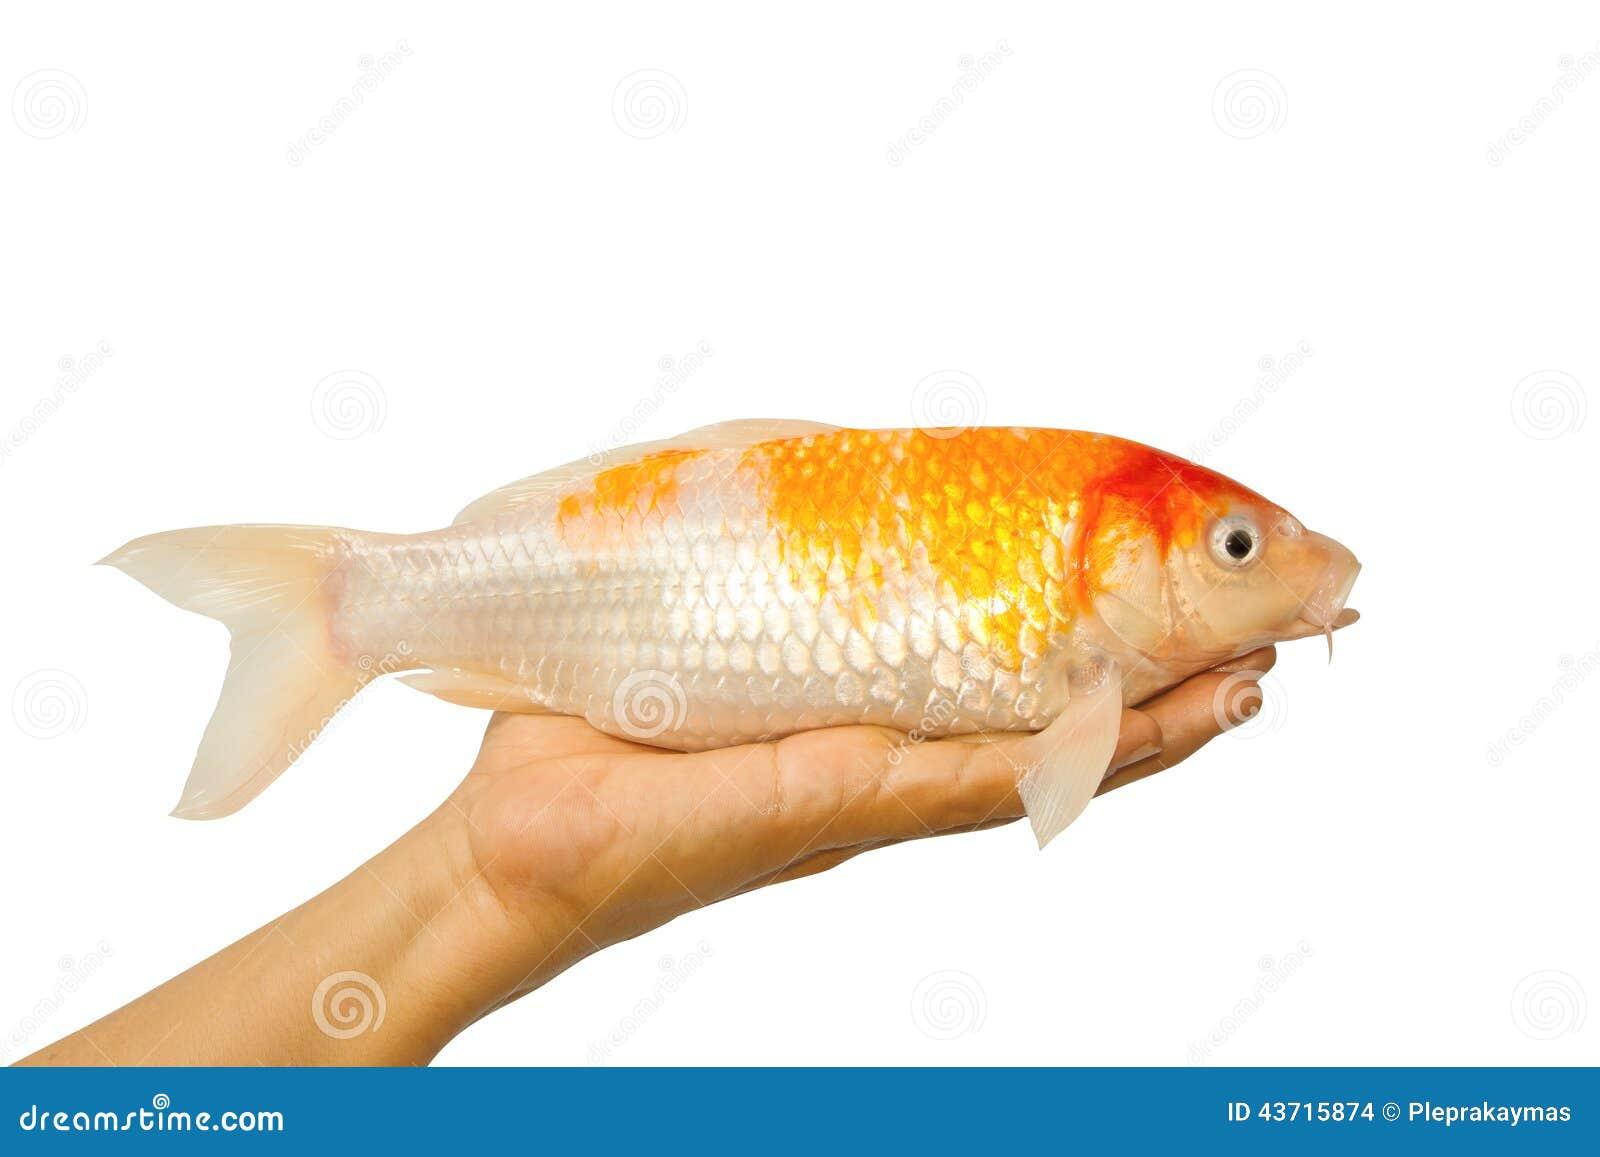 Carp fish koi fish on hand stock photo image 43715874 for Koi and carp